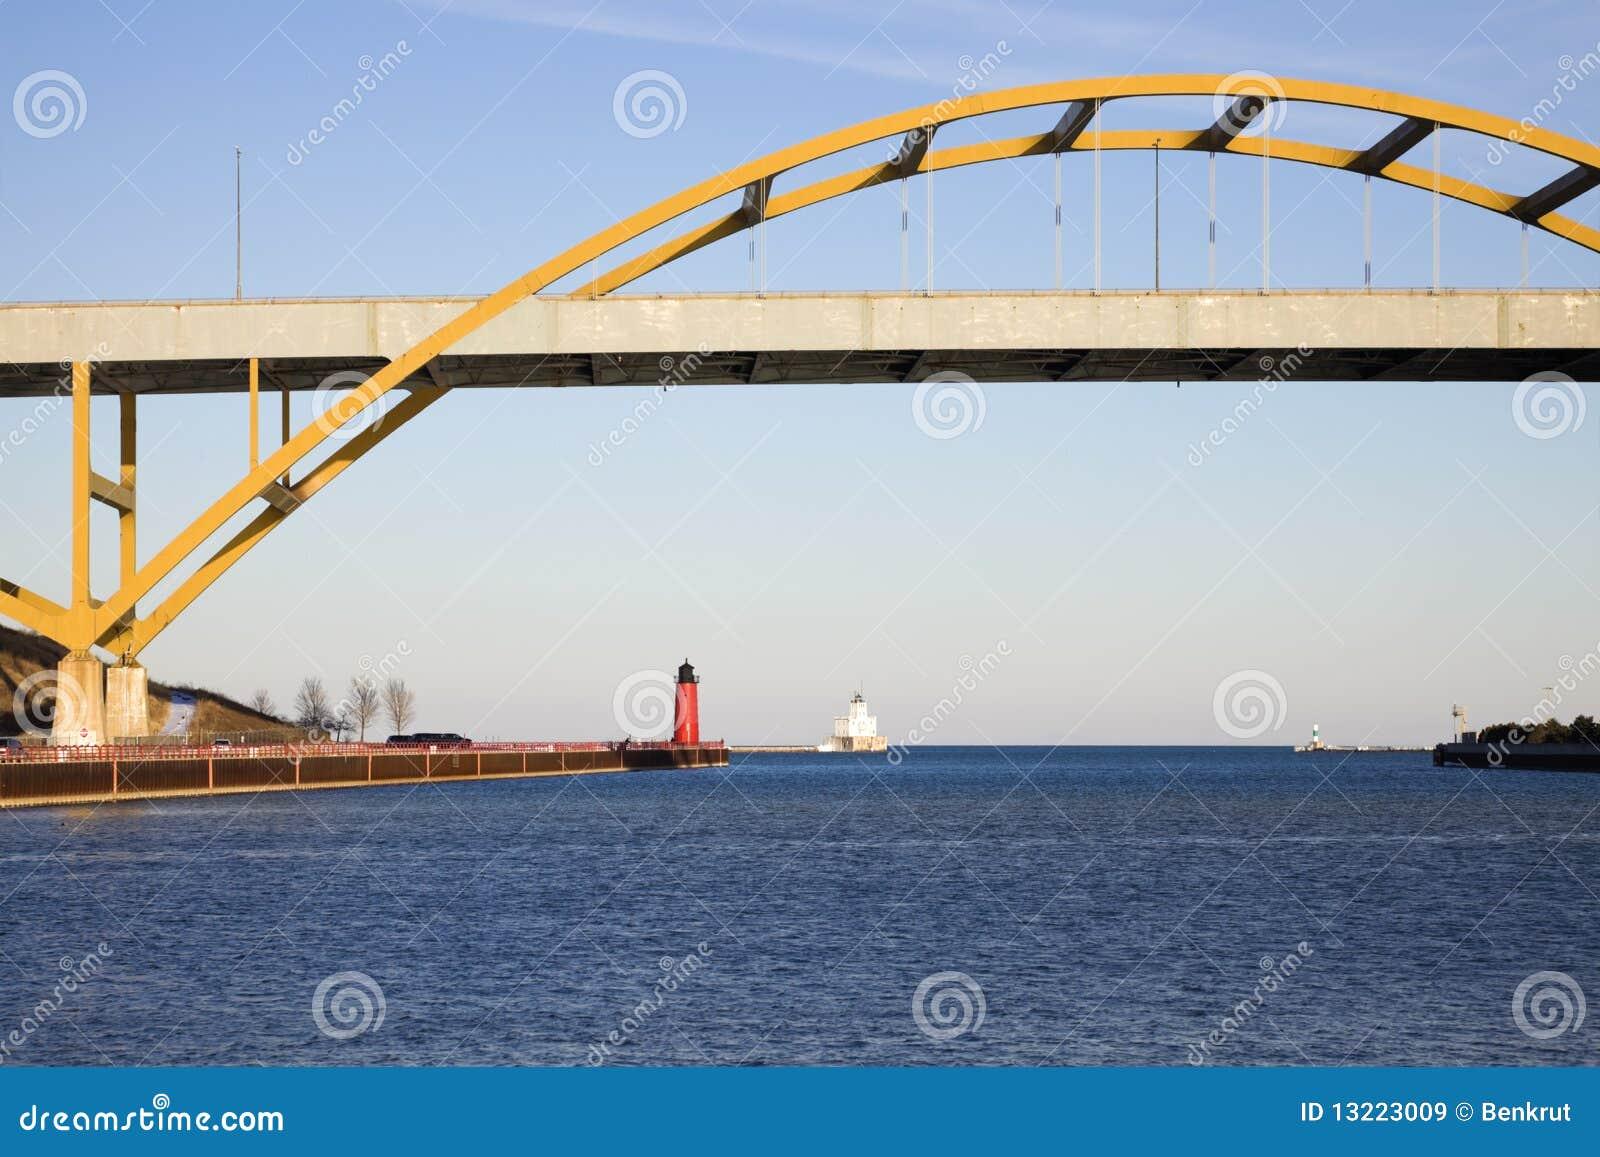 lighthouses under the bridge stock image image of lighthouse rh dreamstime com